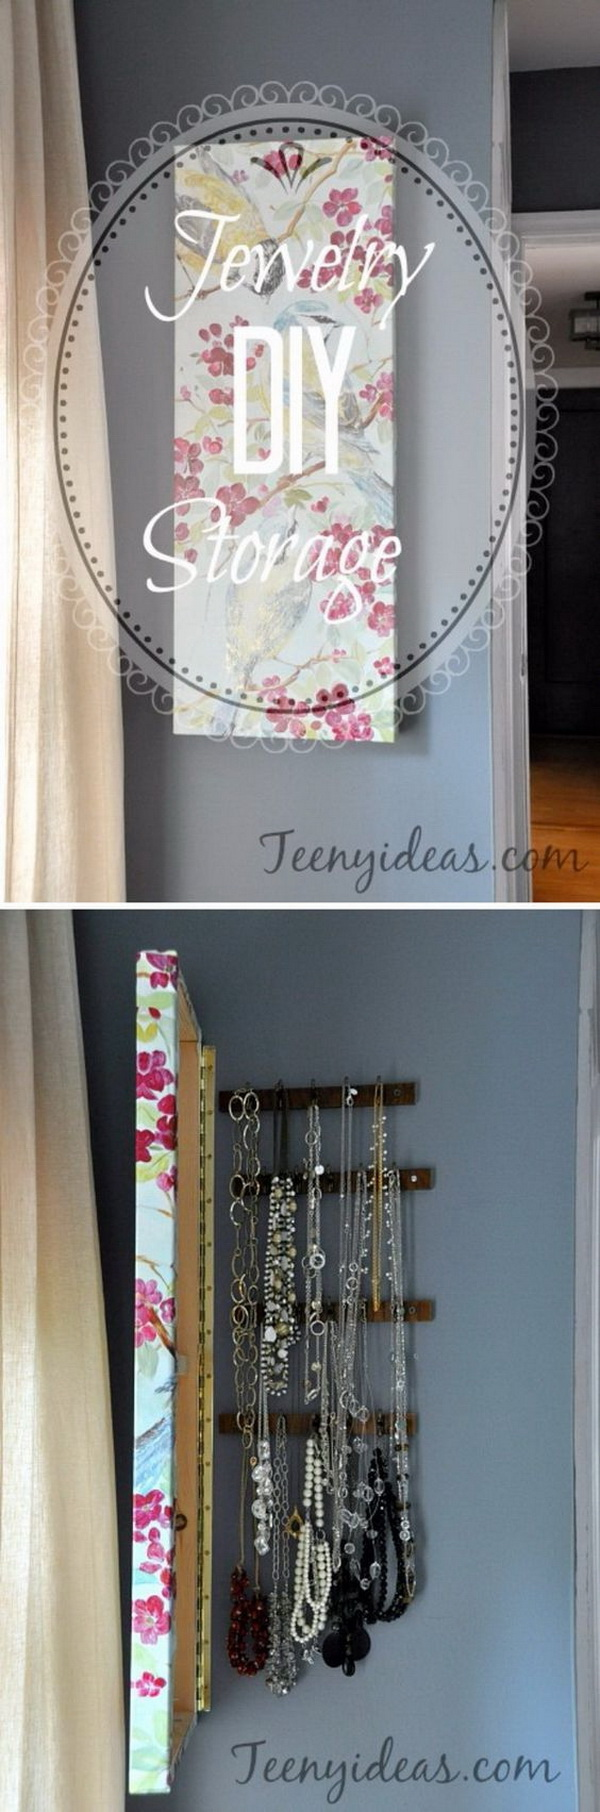 DIY Wall Canvas with Hidden Jewelry Storage & 30 Brilliant DIY Jewelry Storage u0026 Display Ideas - For Creative Juice